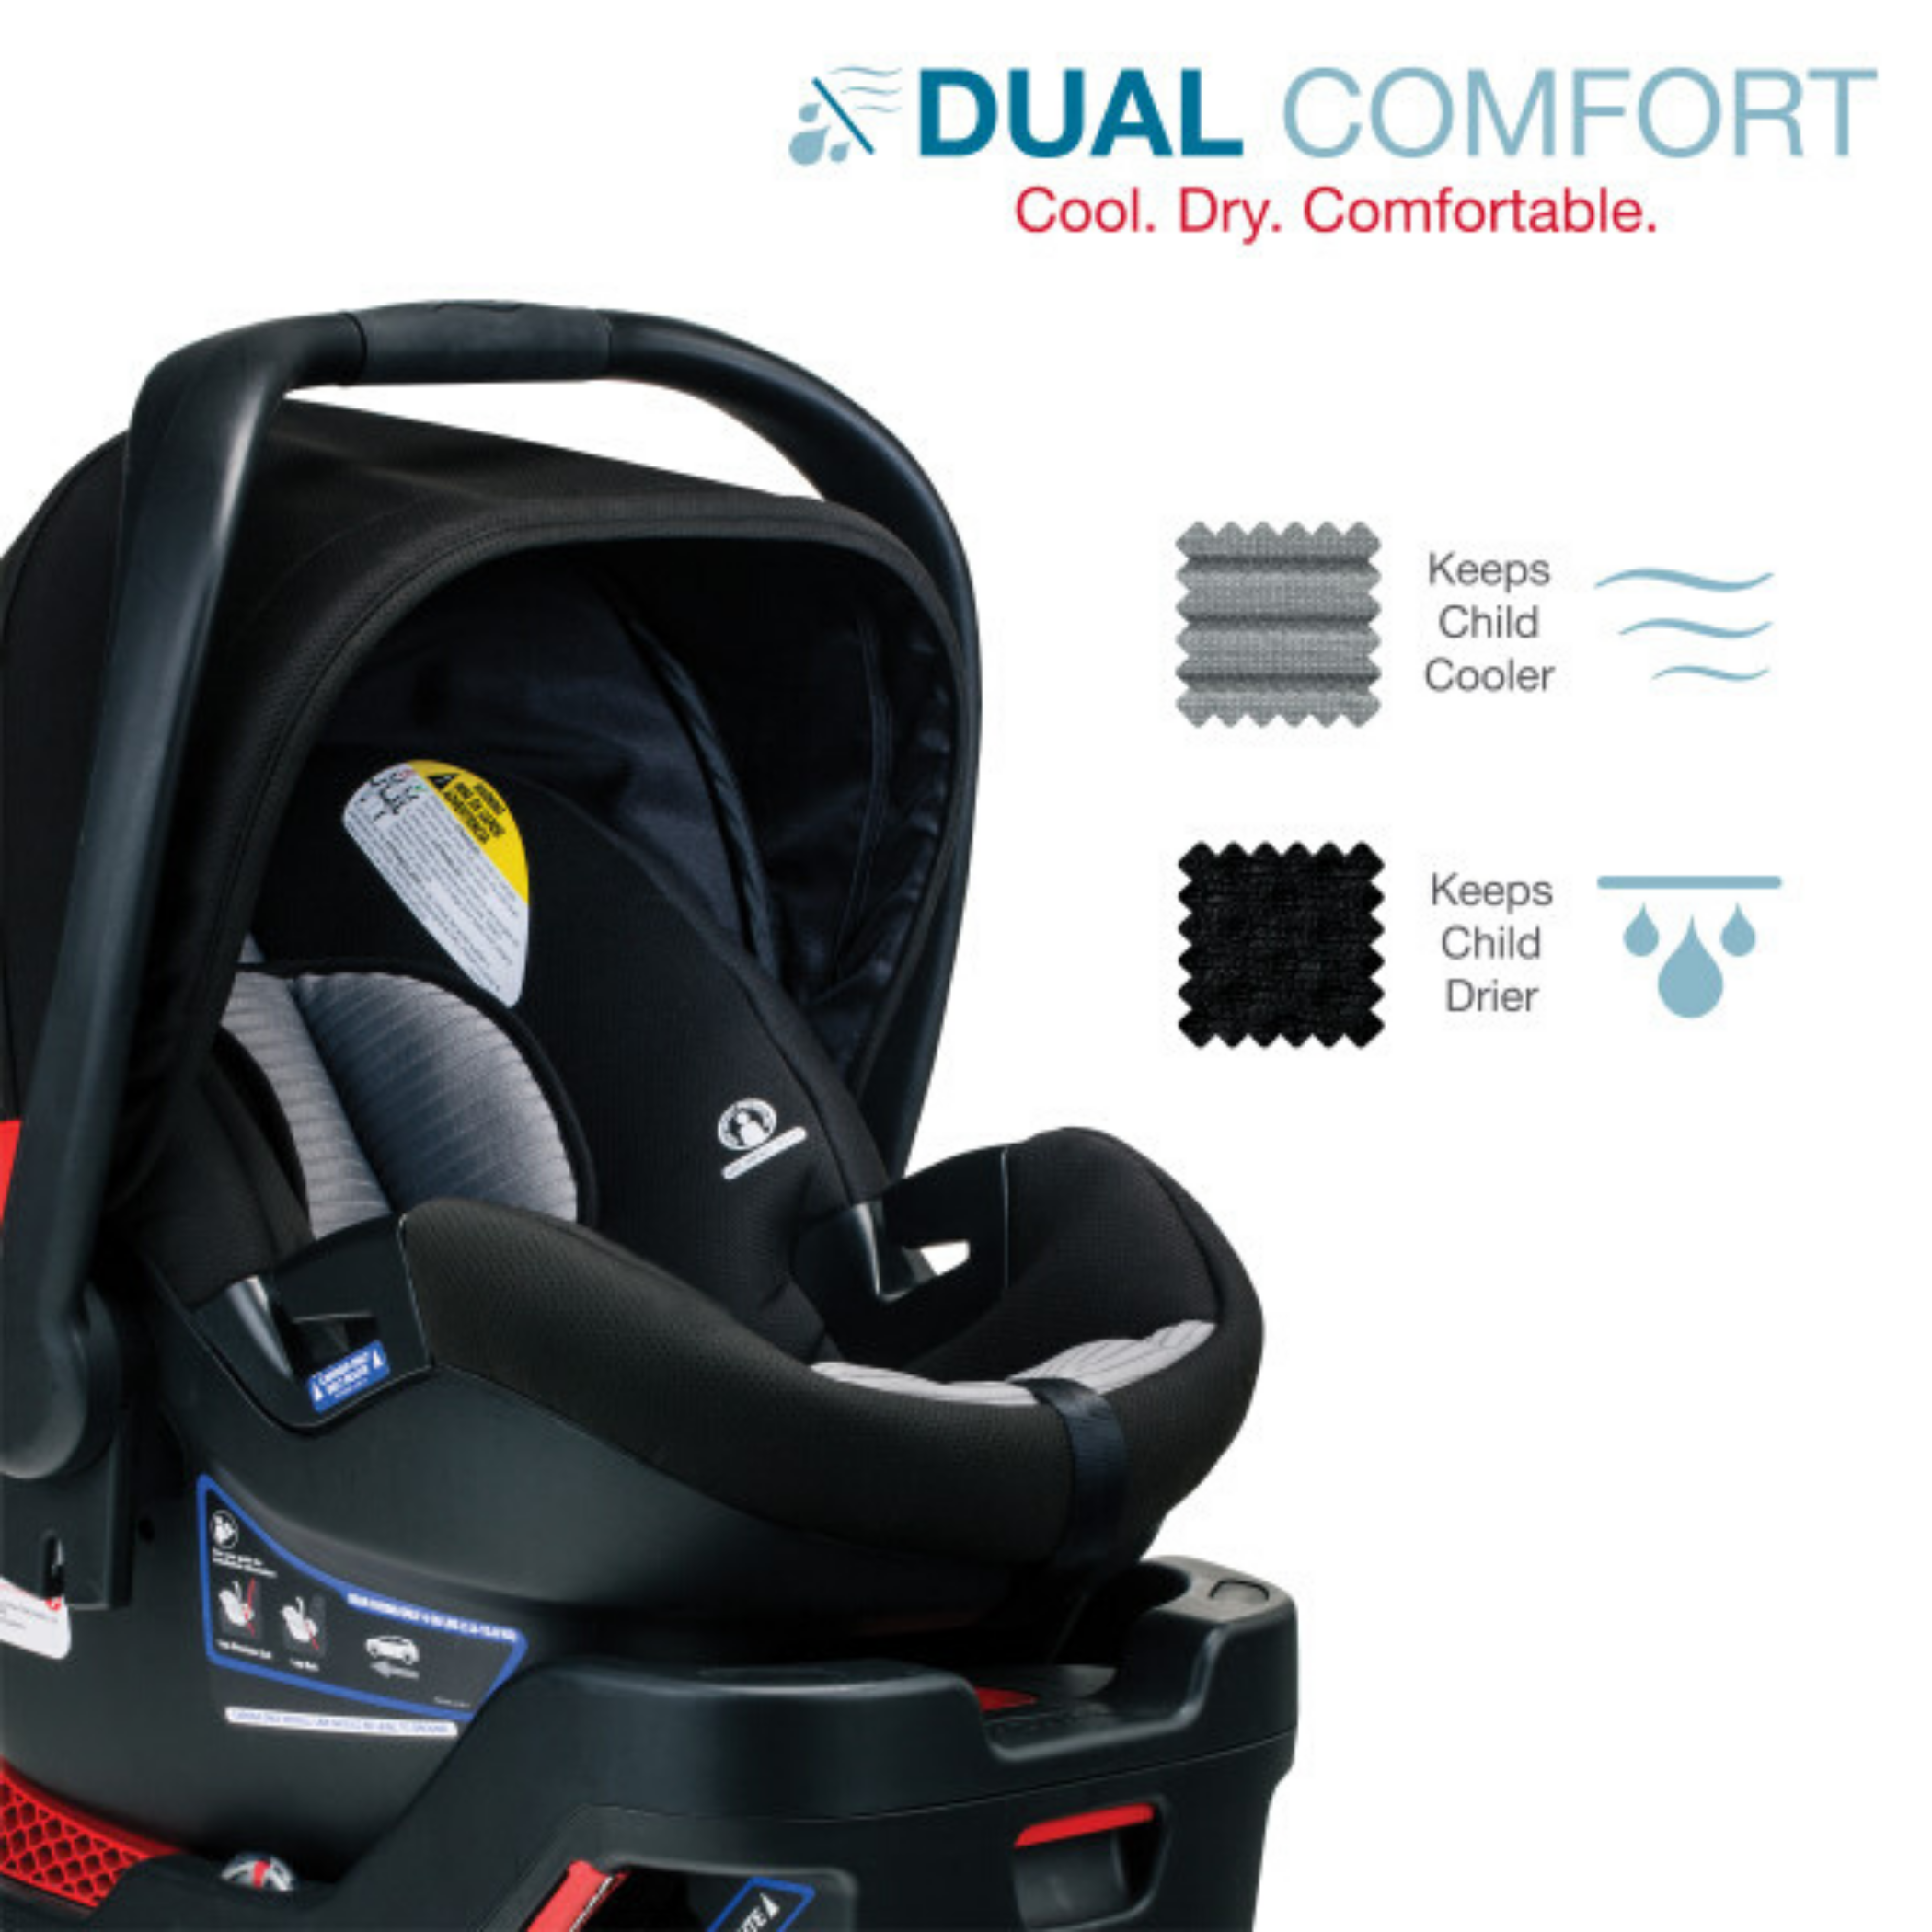 B Safe 35 Infant Car Seat Dual Comfort, How To Wash Britax B Safe 35 Car Seat